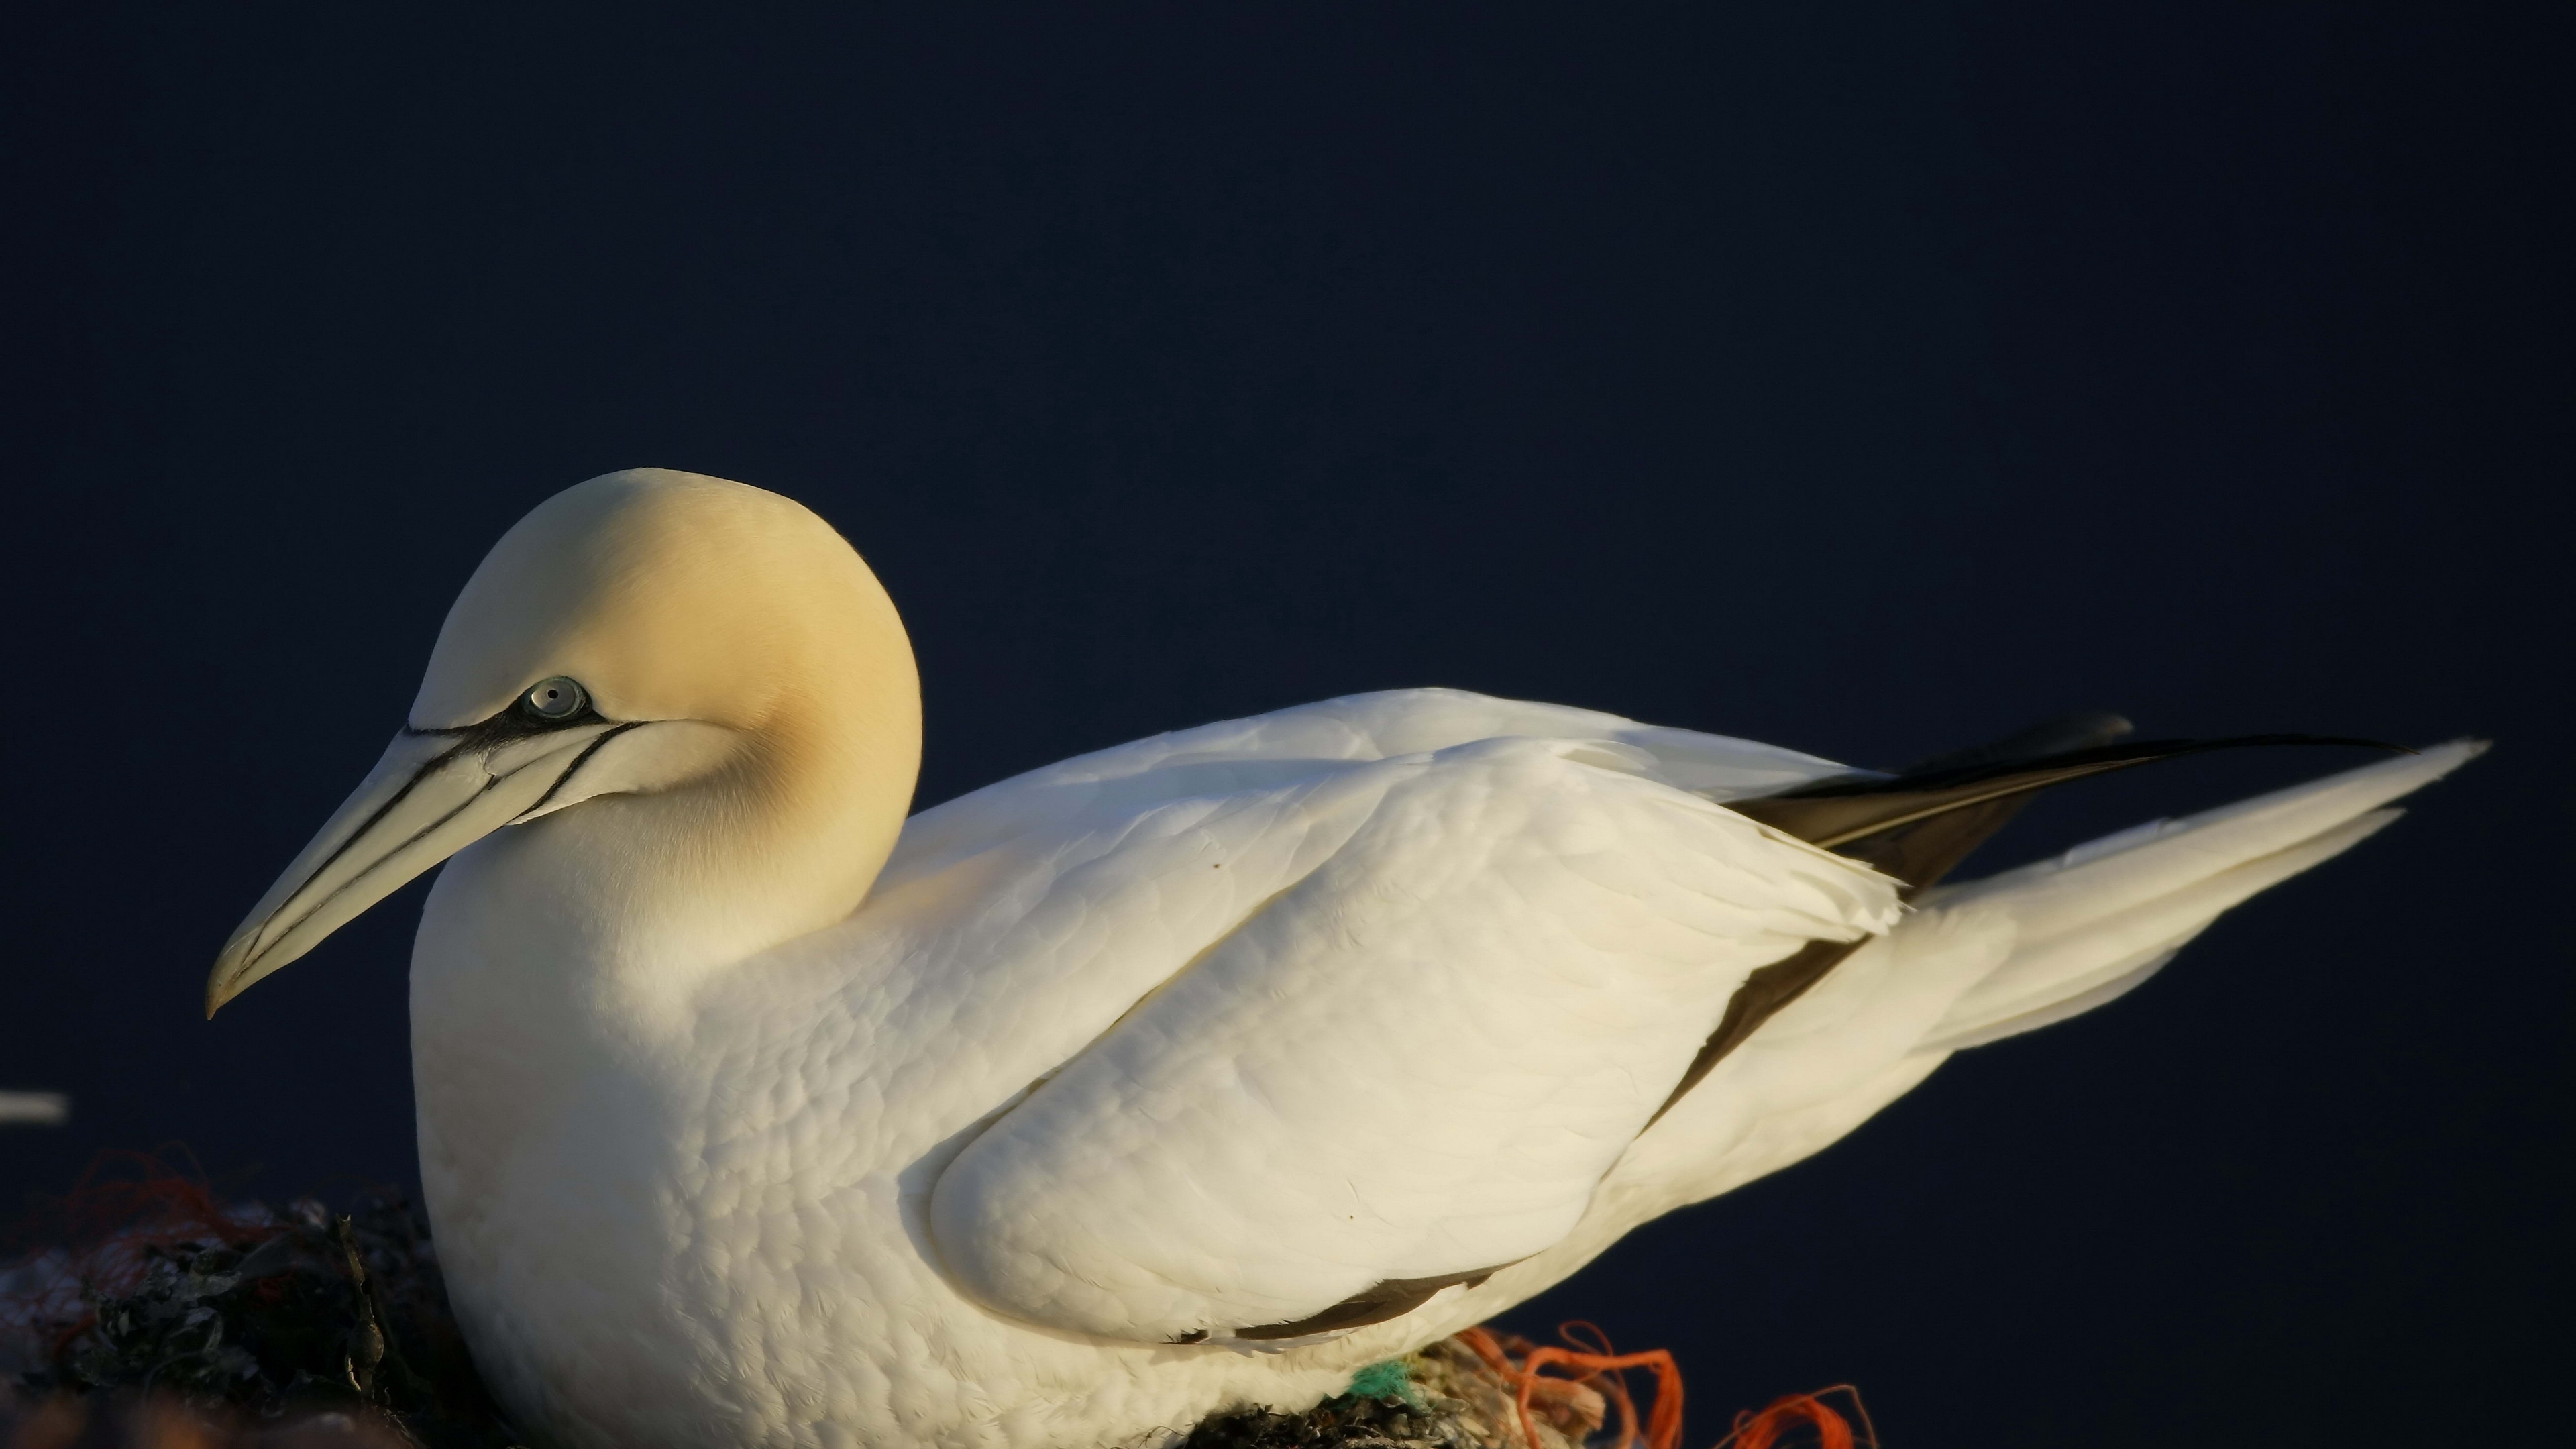 bird nest seagull 4k 1542241625 - bird, nest, seagull 4k - Seagull, Nest, Bird